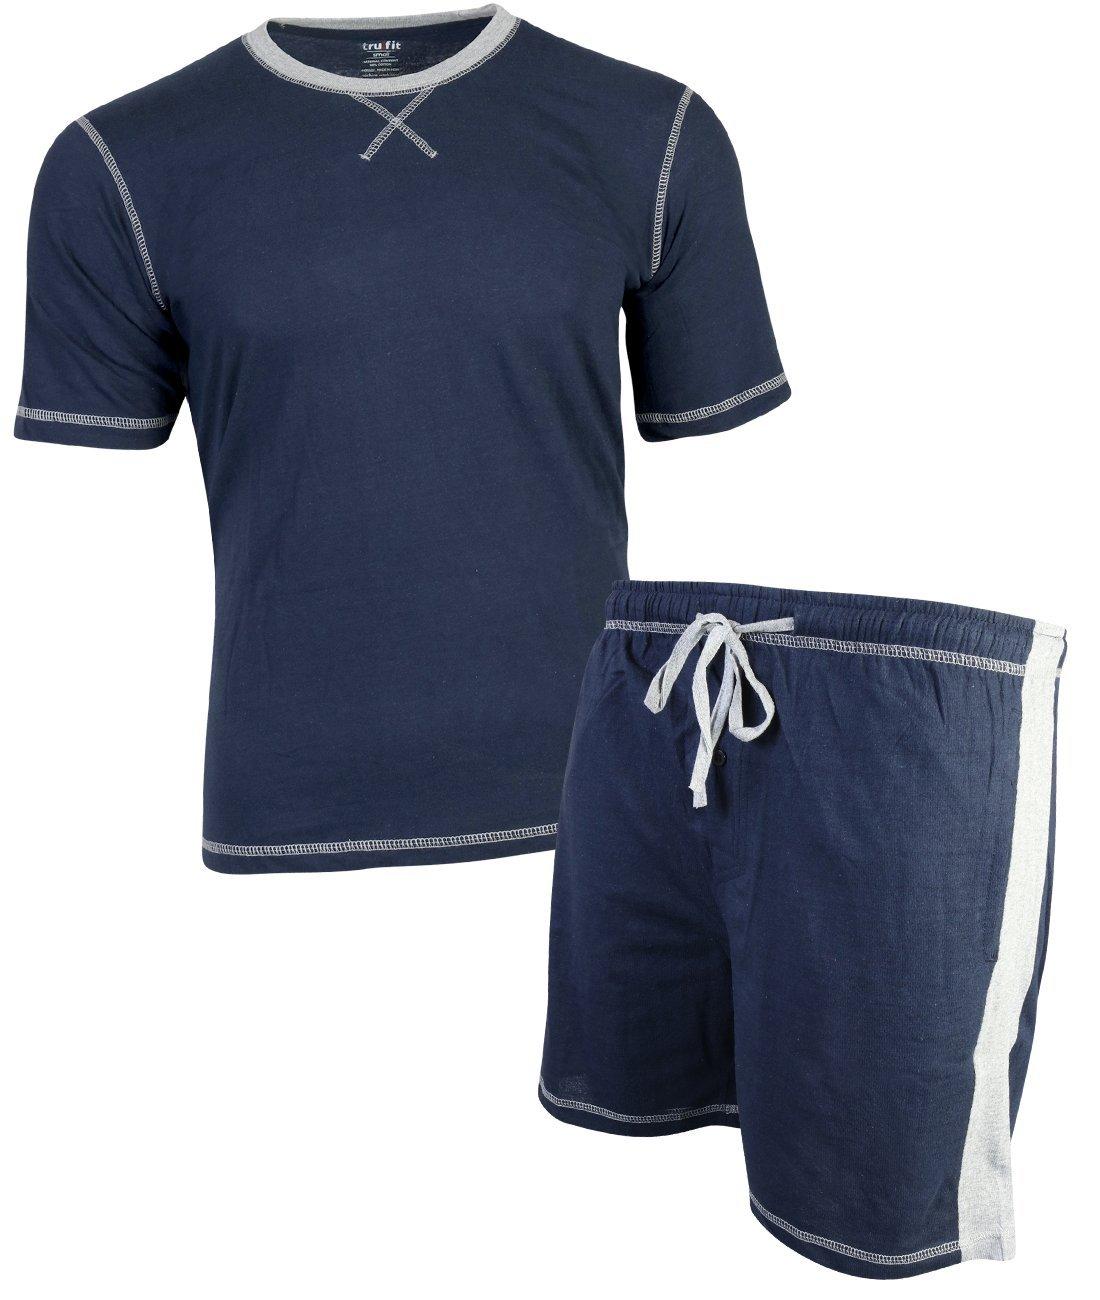 TruFit Men's 2-Piece Short Sleeve Shirt and Shorts Pajama Set, Navy, XX-Large'